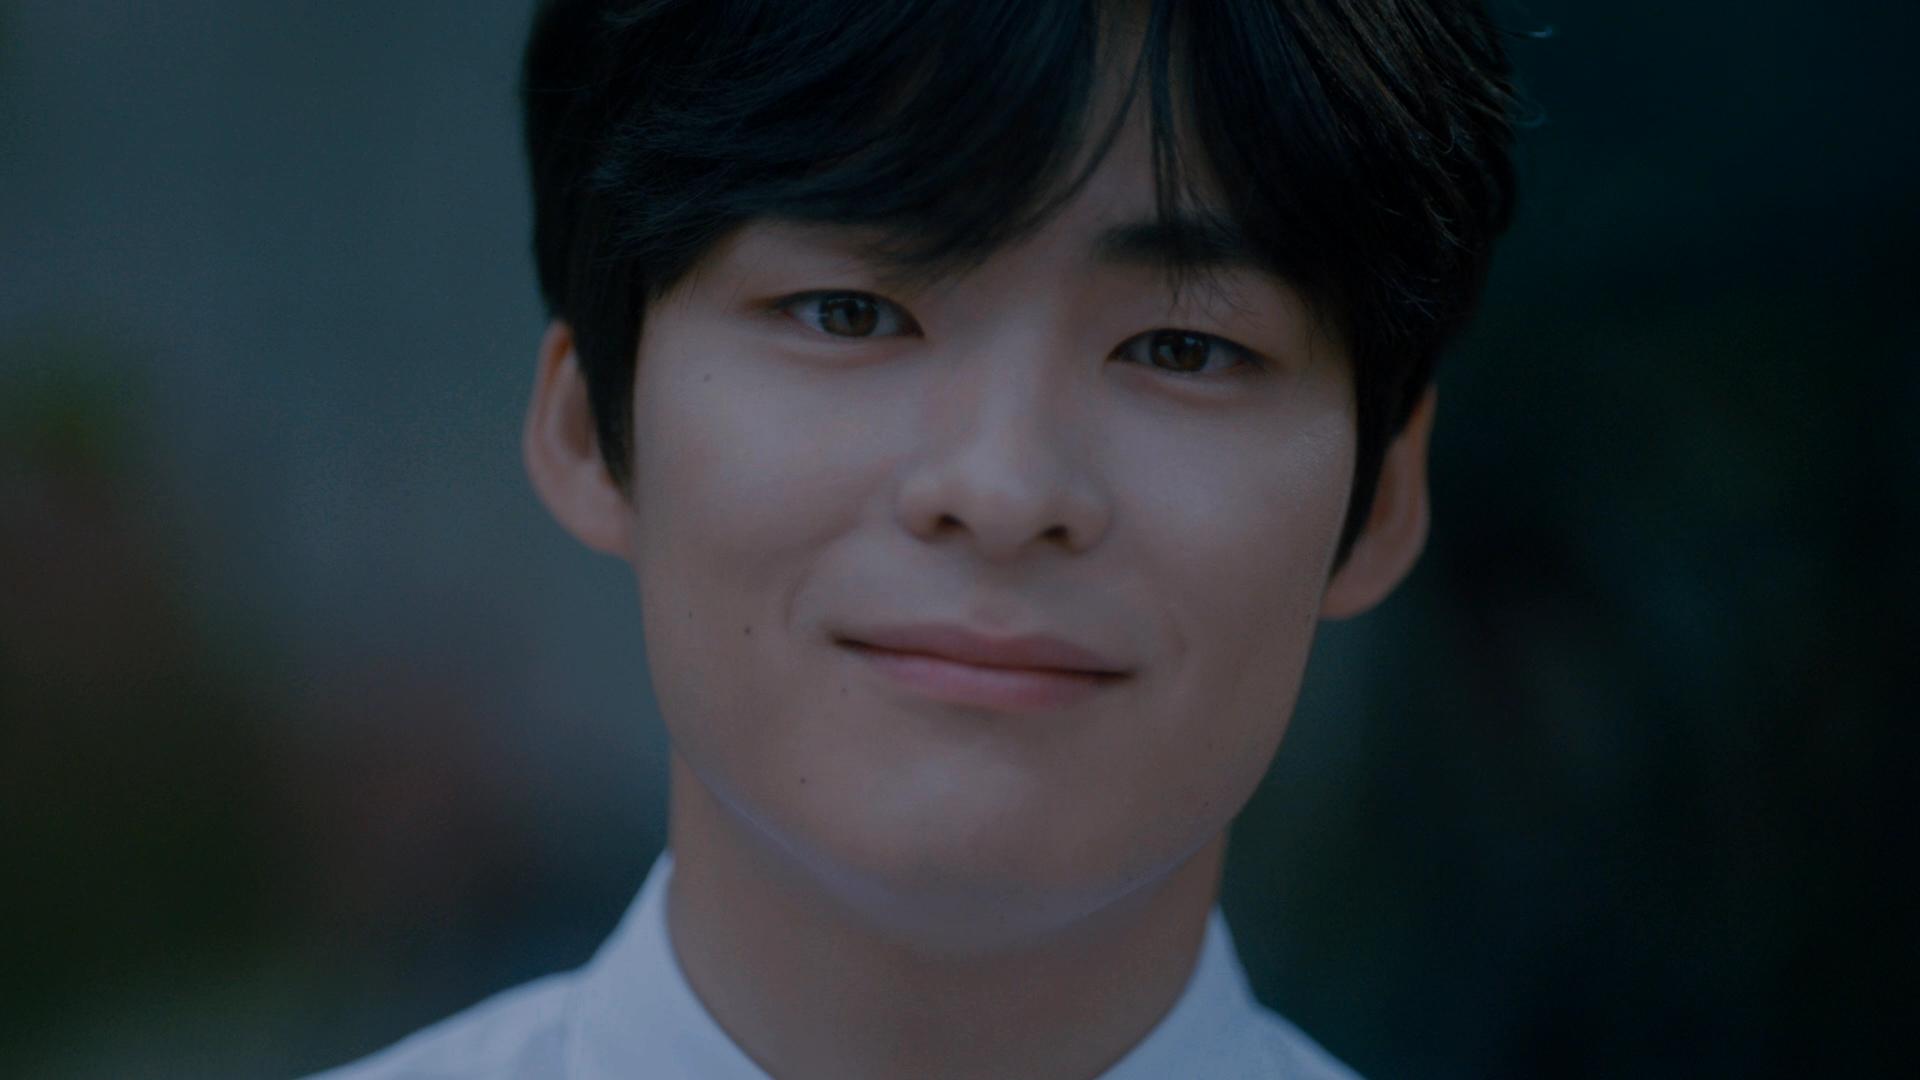 [MV] 박재정 Parc Jae Jung - 다시 태어날 수 있다면 If Only